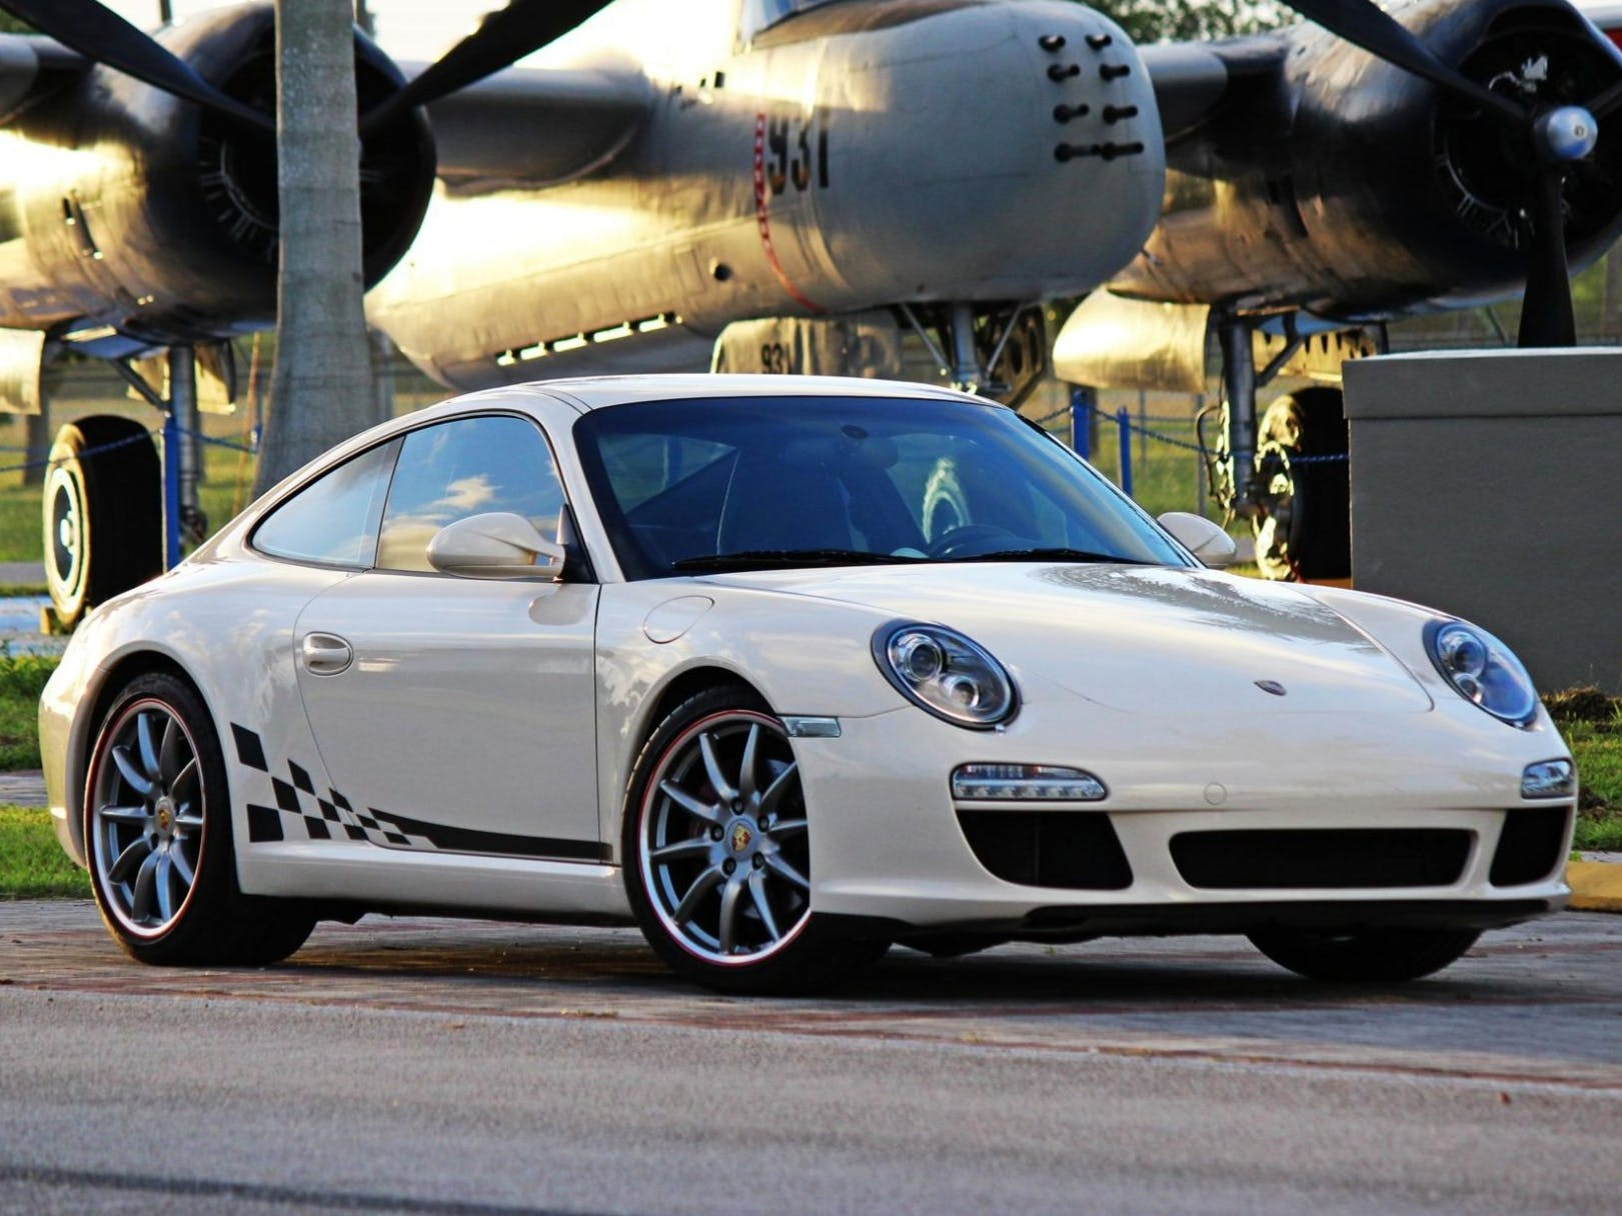 2009 Porsche 911 Carrera S Coupe